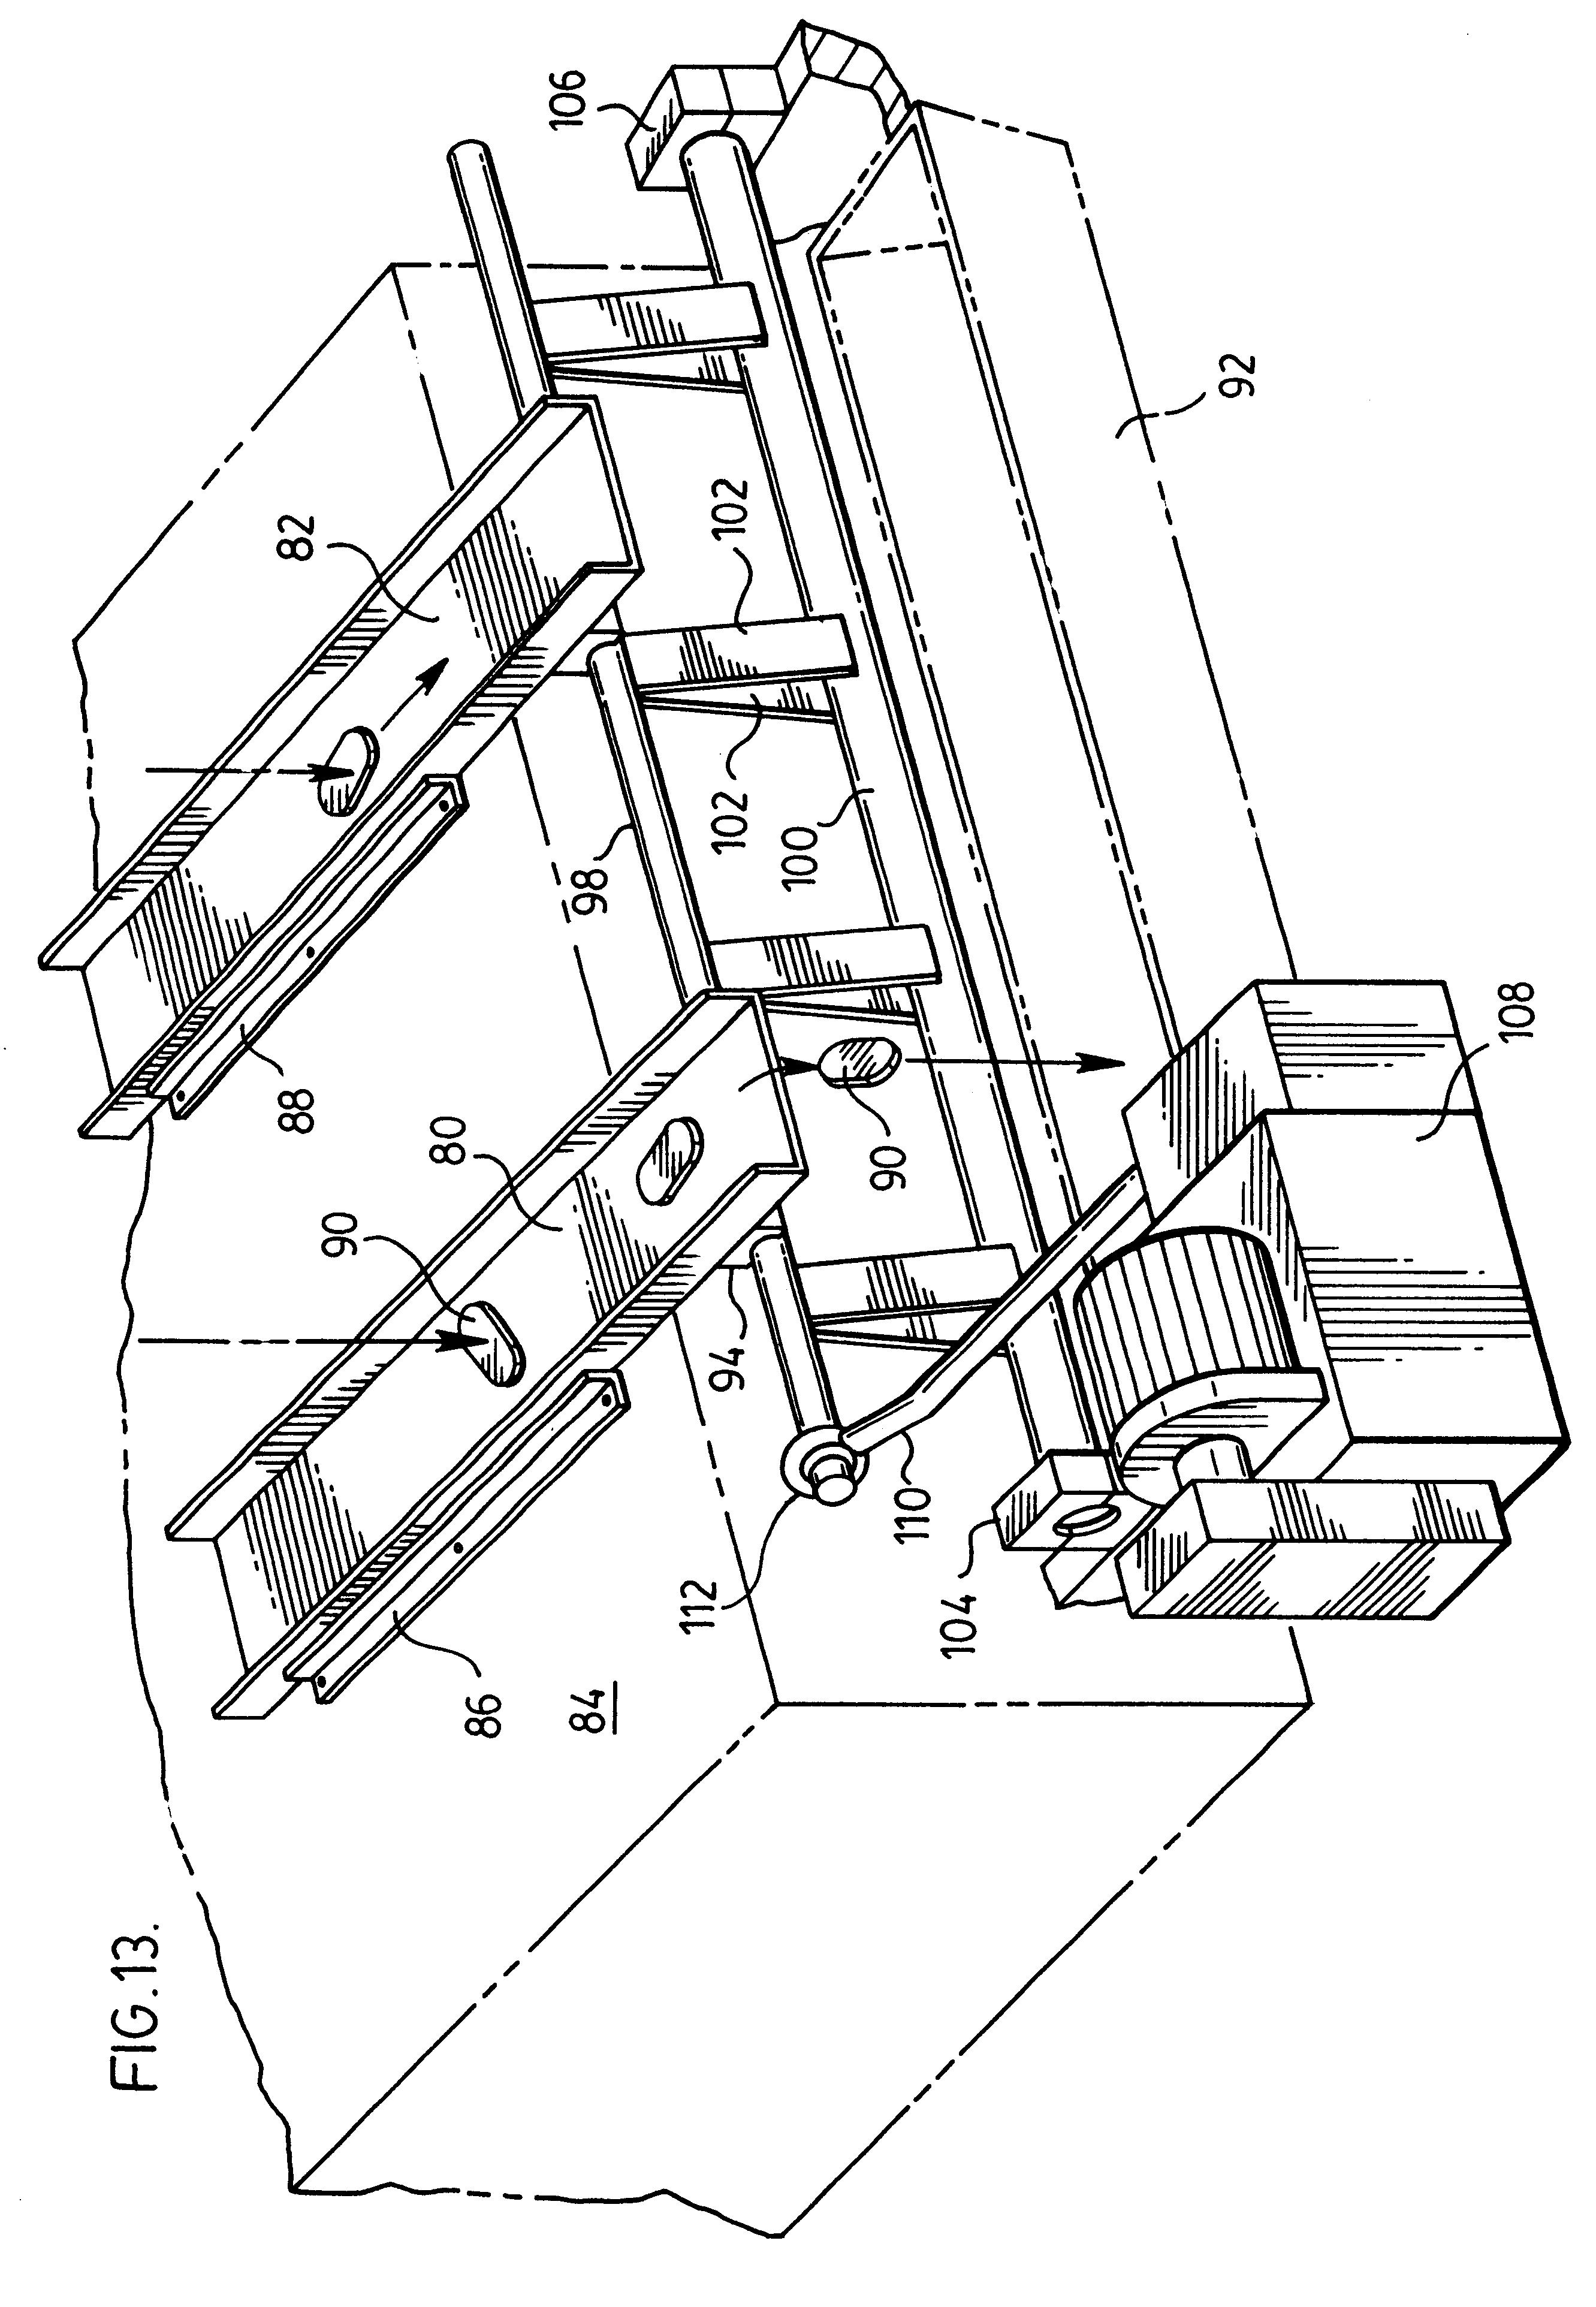 1990 Toyota Camry Seat Belt Wiring Diagram